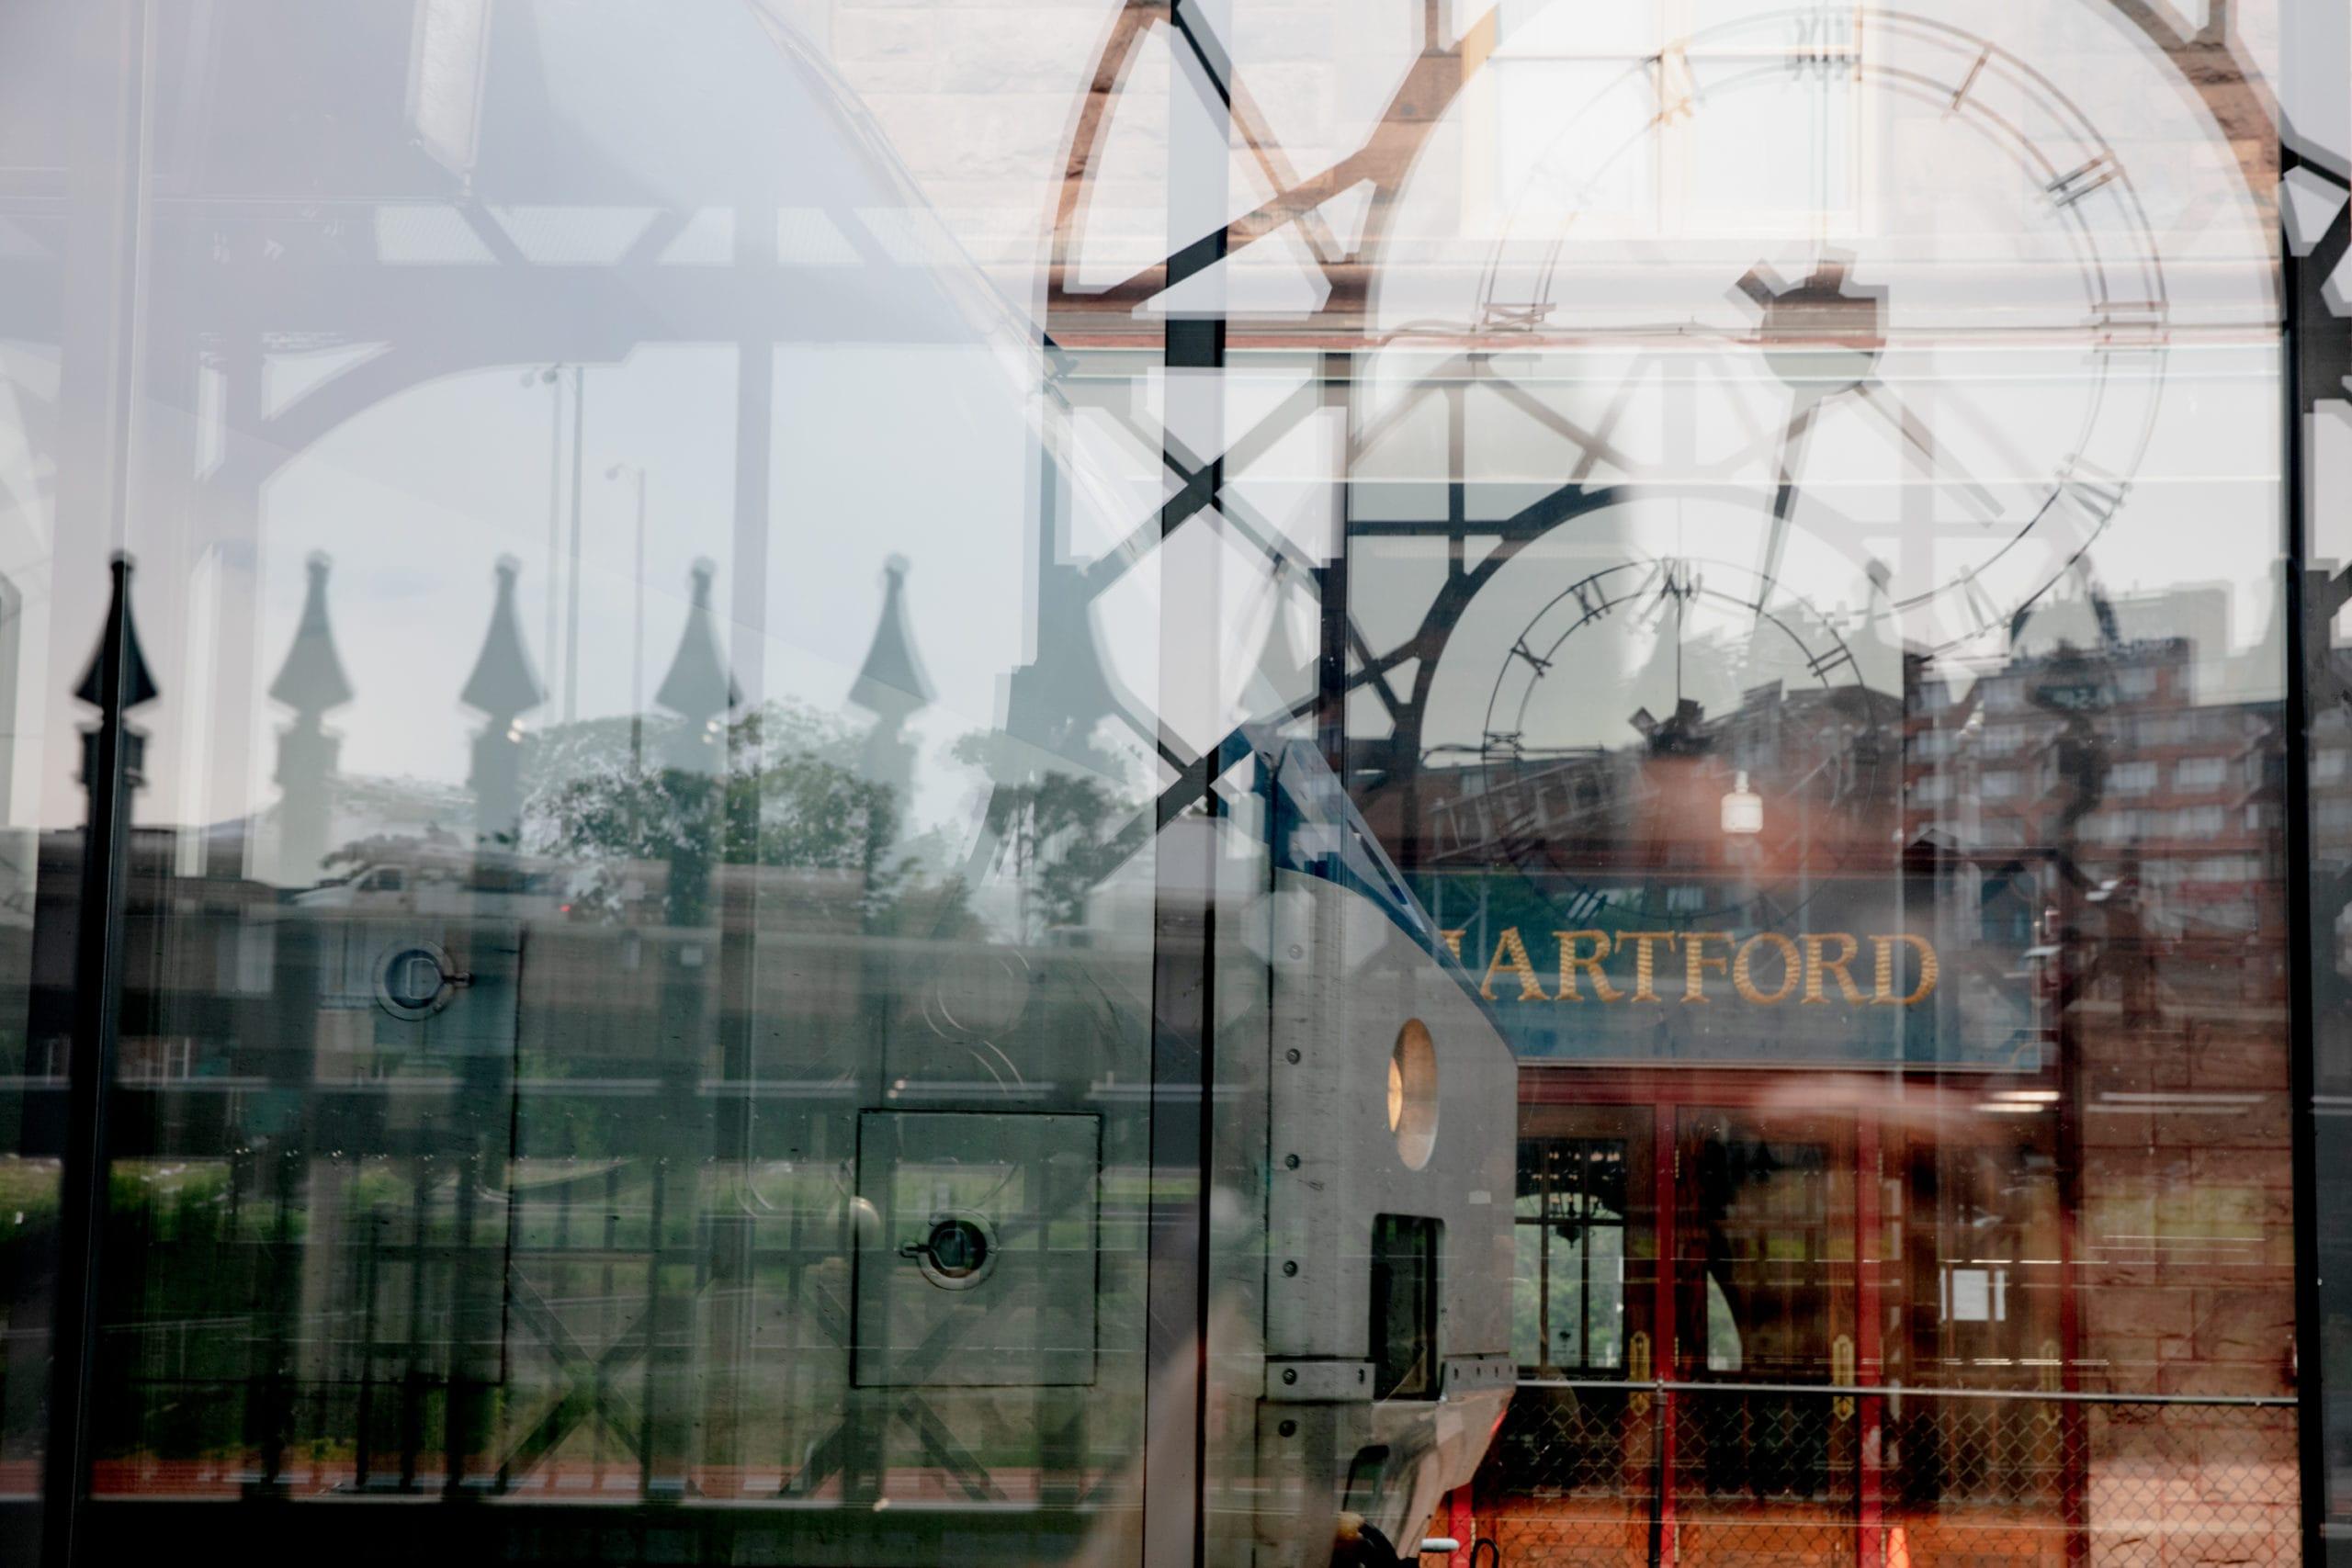 Photos: Scenes around Hartford's Union Station